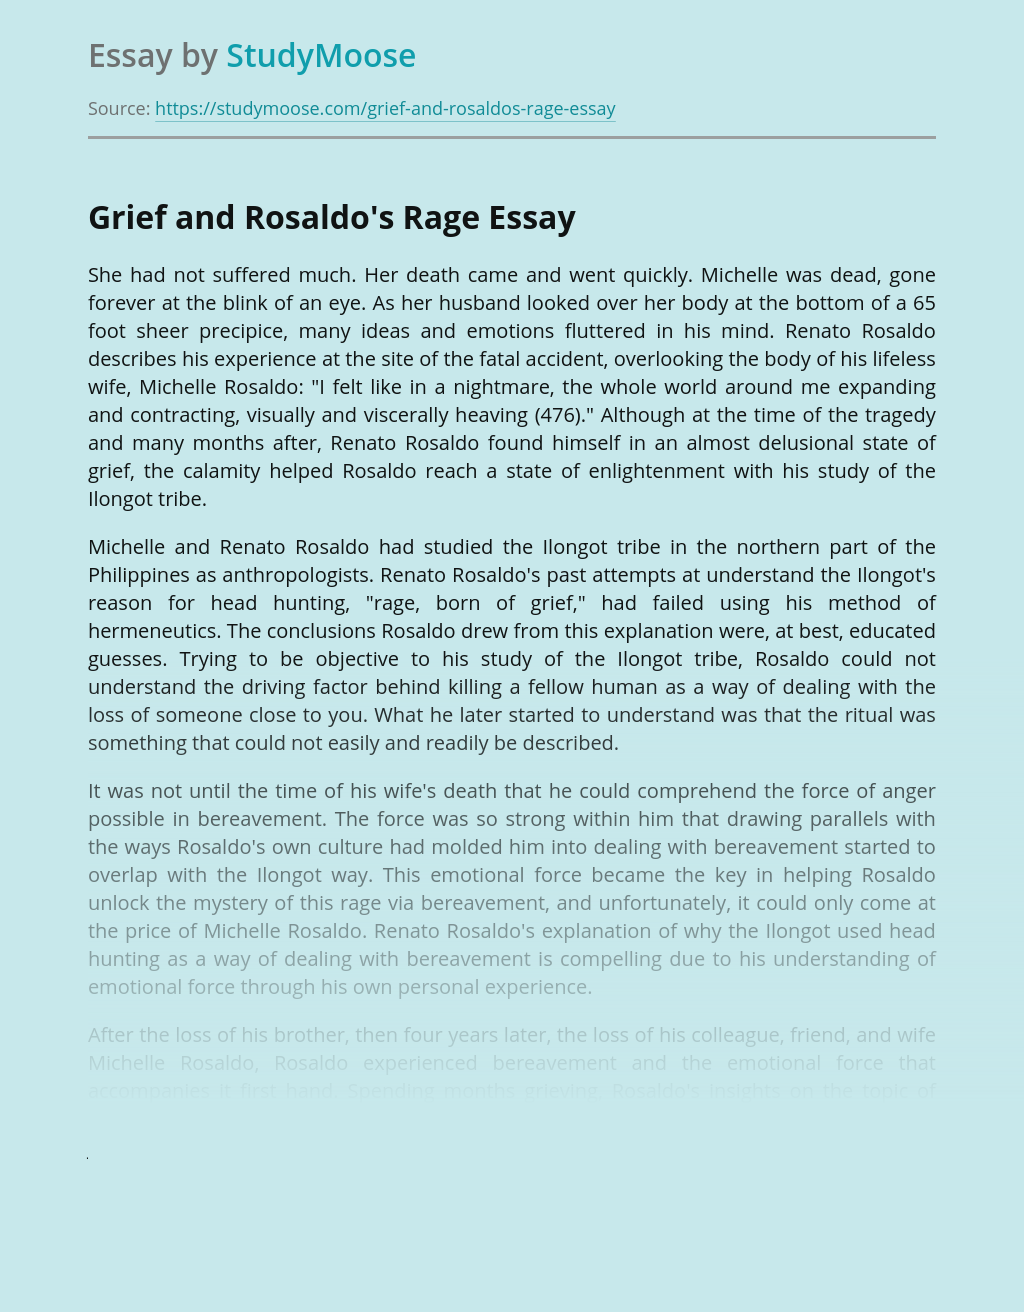 Grief and Rosaldo's Rage